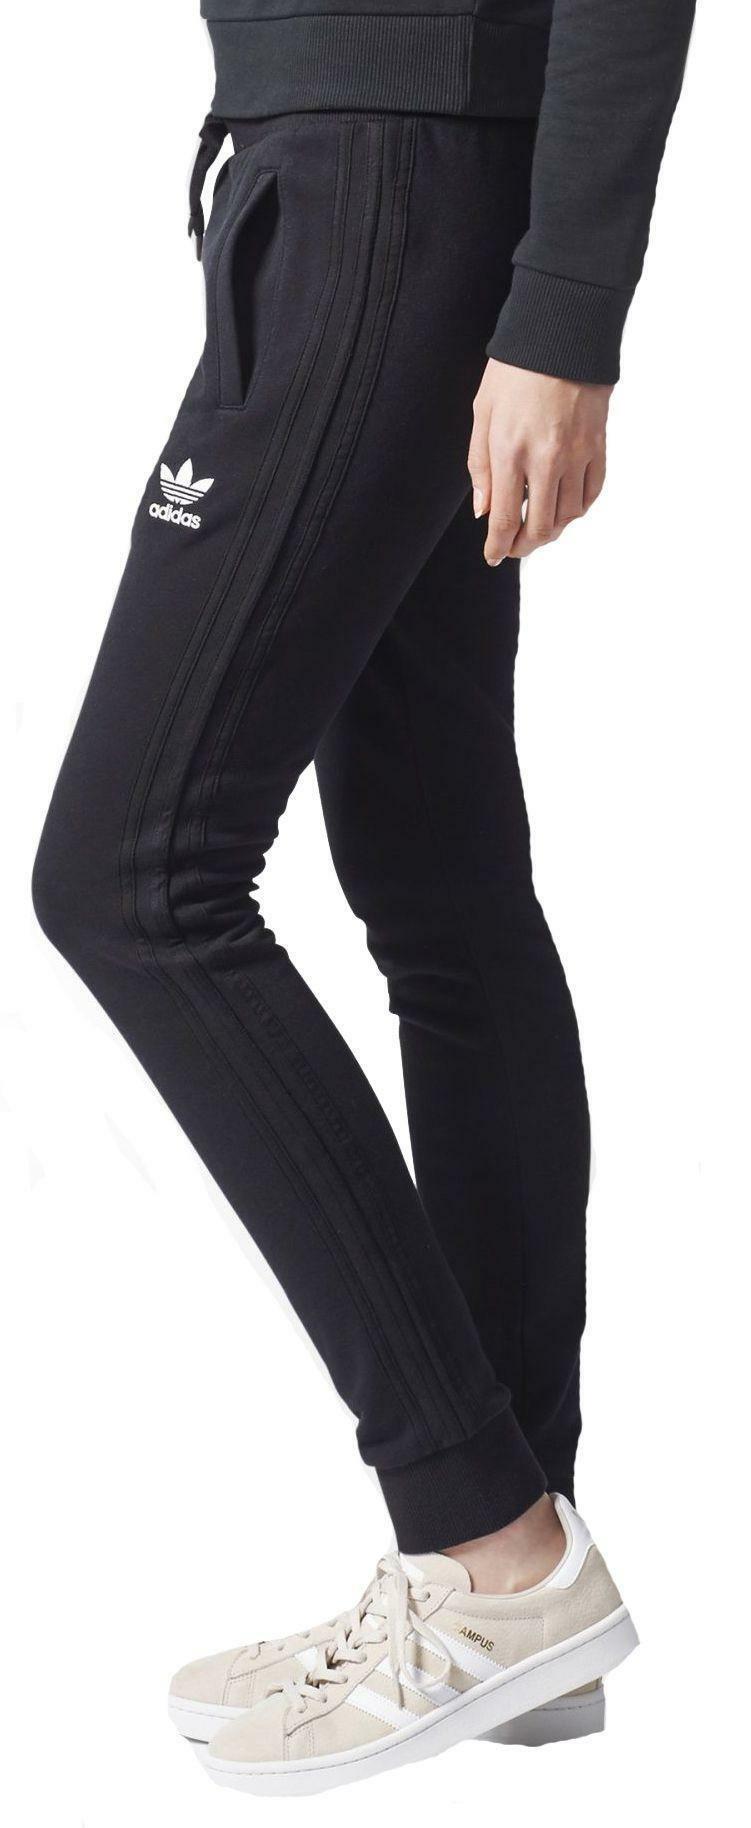 adidas adidas slim tp cuf pantaloni tuta donna neri